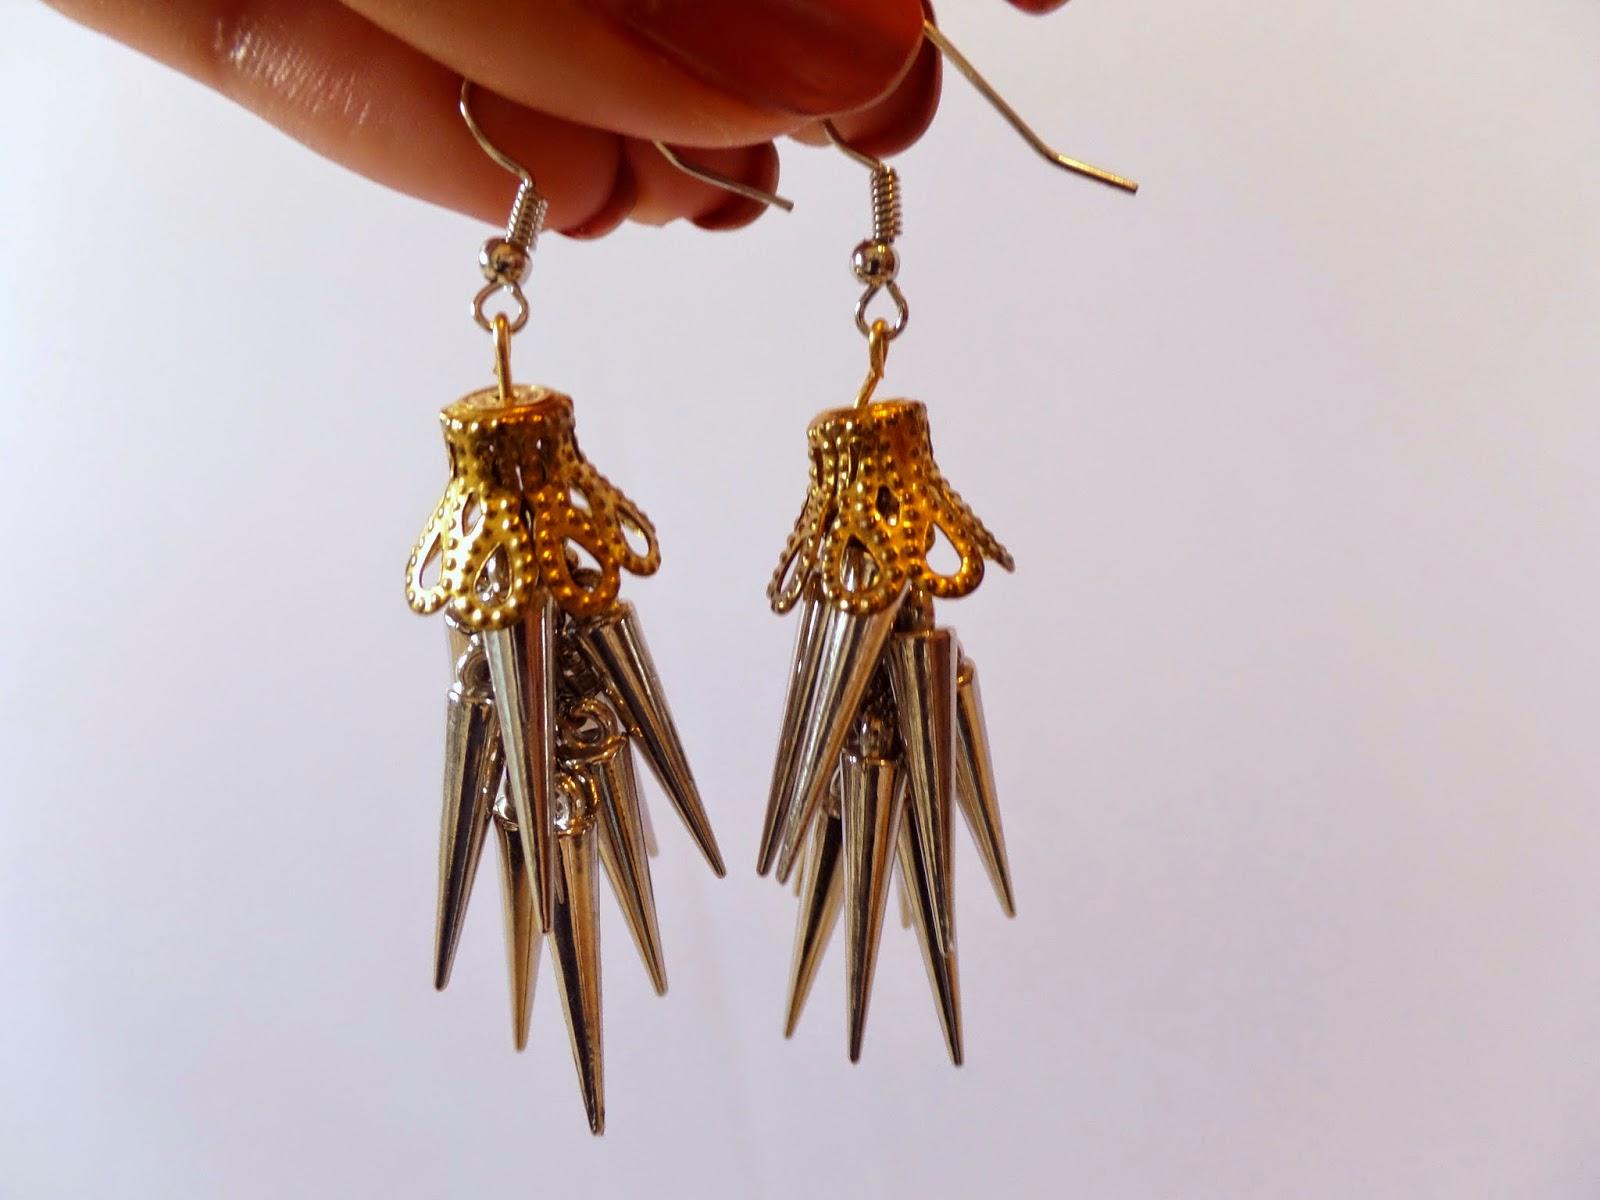 diy: hanging spike earrings | facades and nuances: diy: hanging